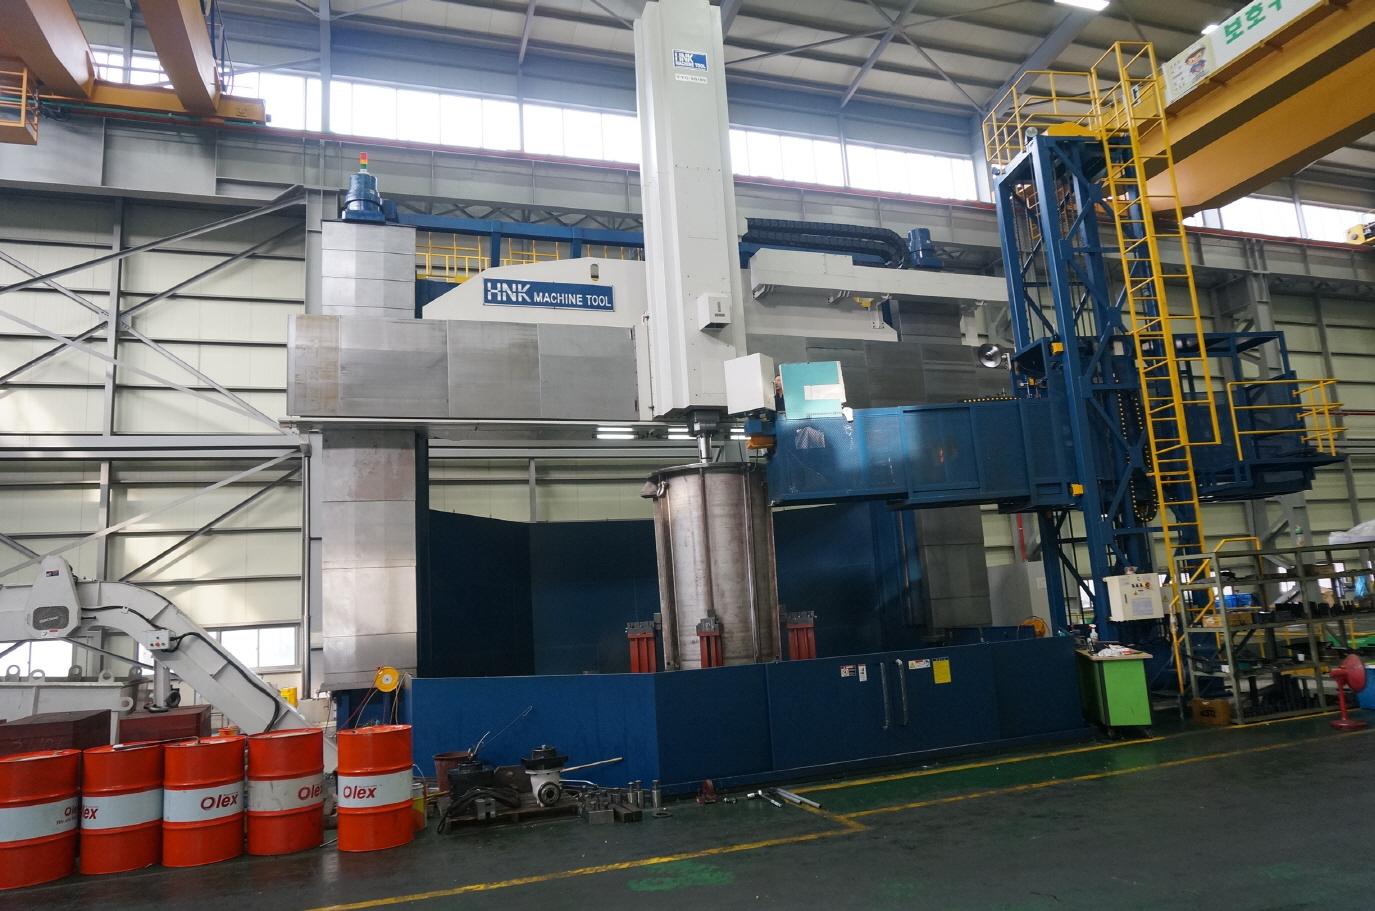 Hnk Vtc 50 85 Cnc Heavy Duty Double Column Vertical Boring